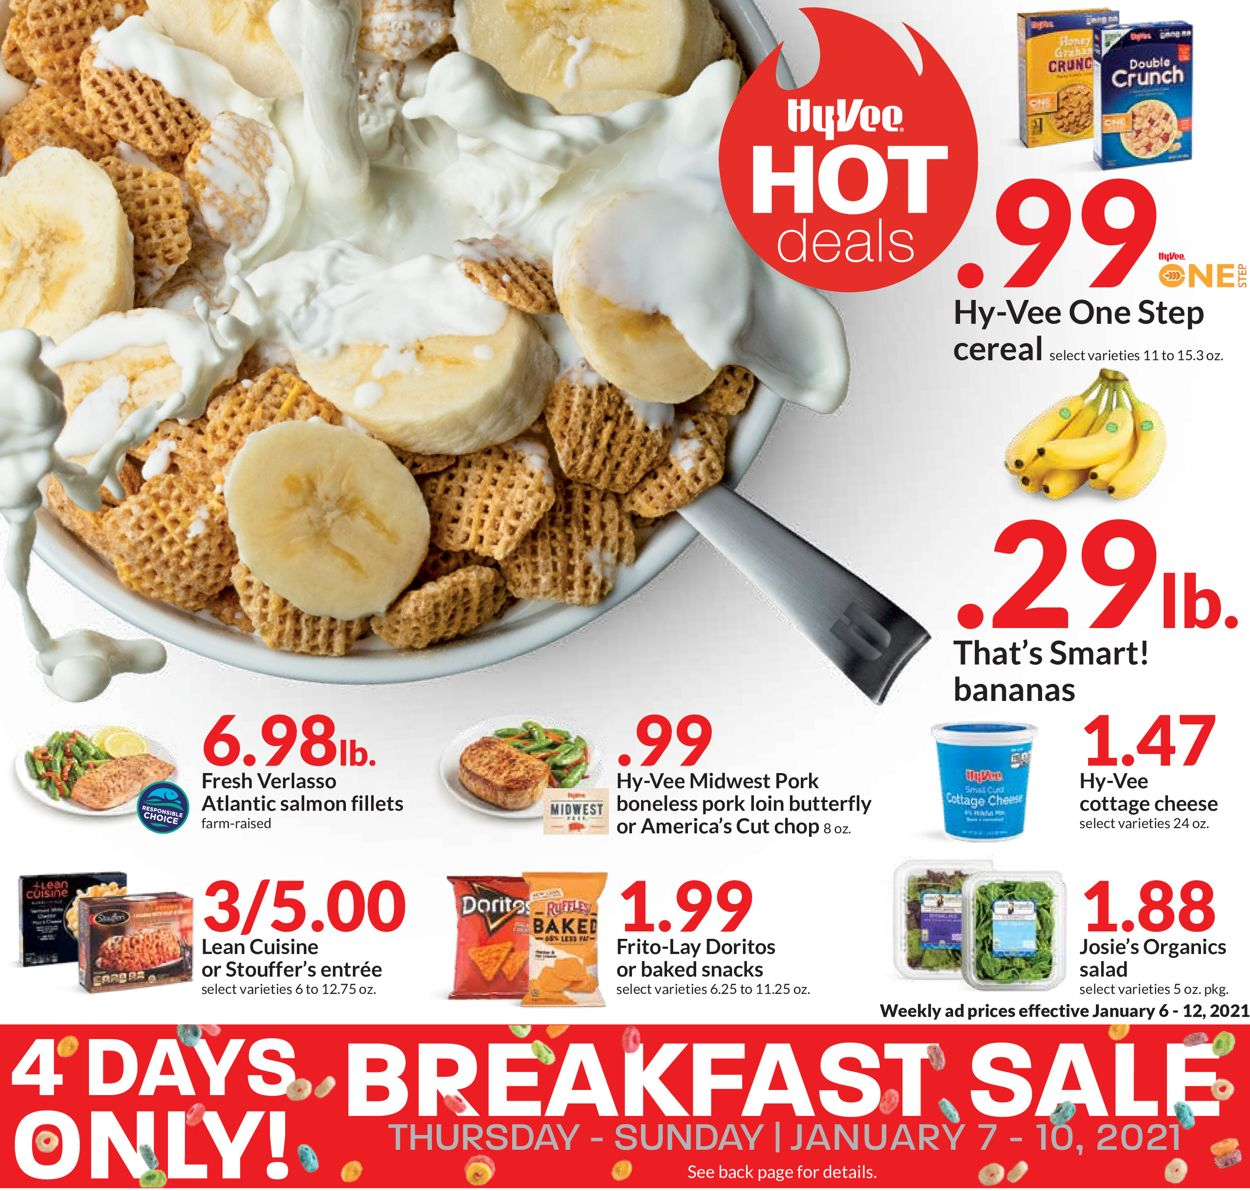 HyVee Hot Deals 2021 Weekly Ad Circular - valid 01/07-01/10/2021